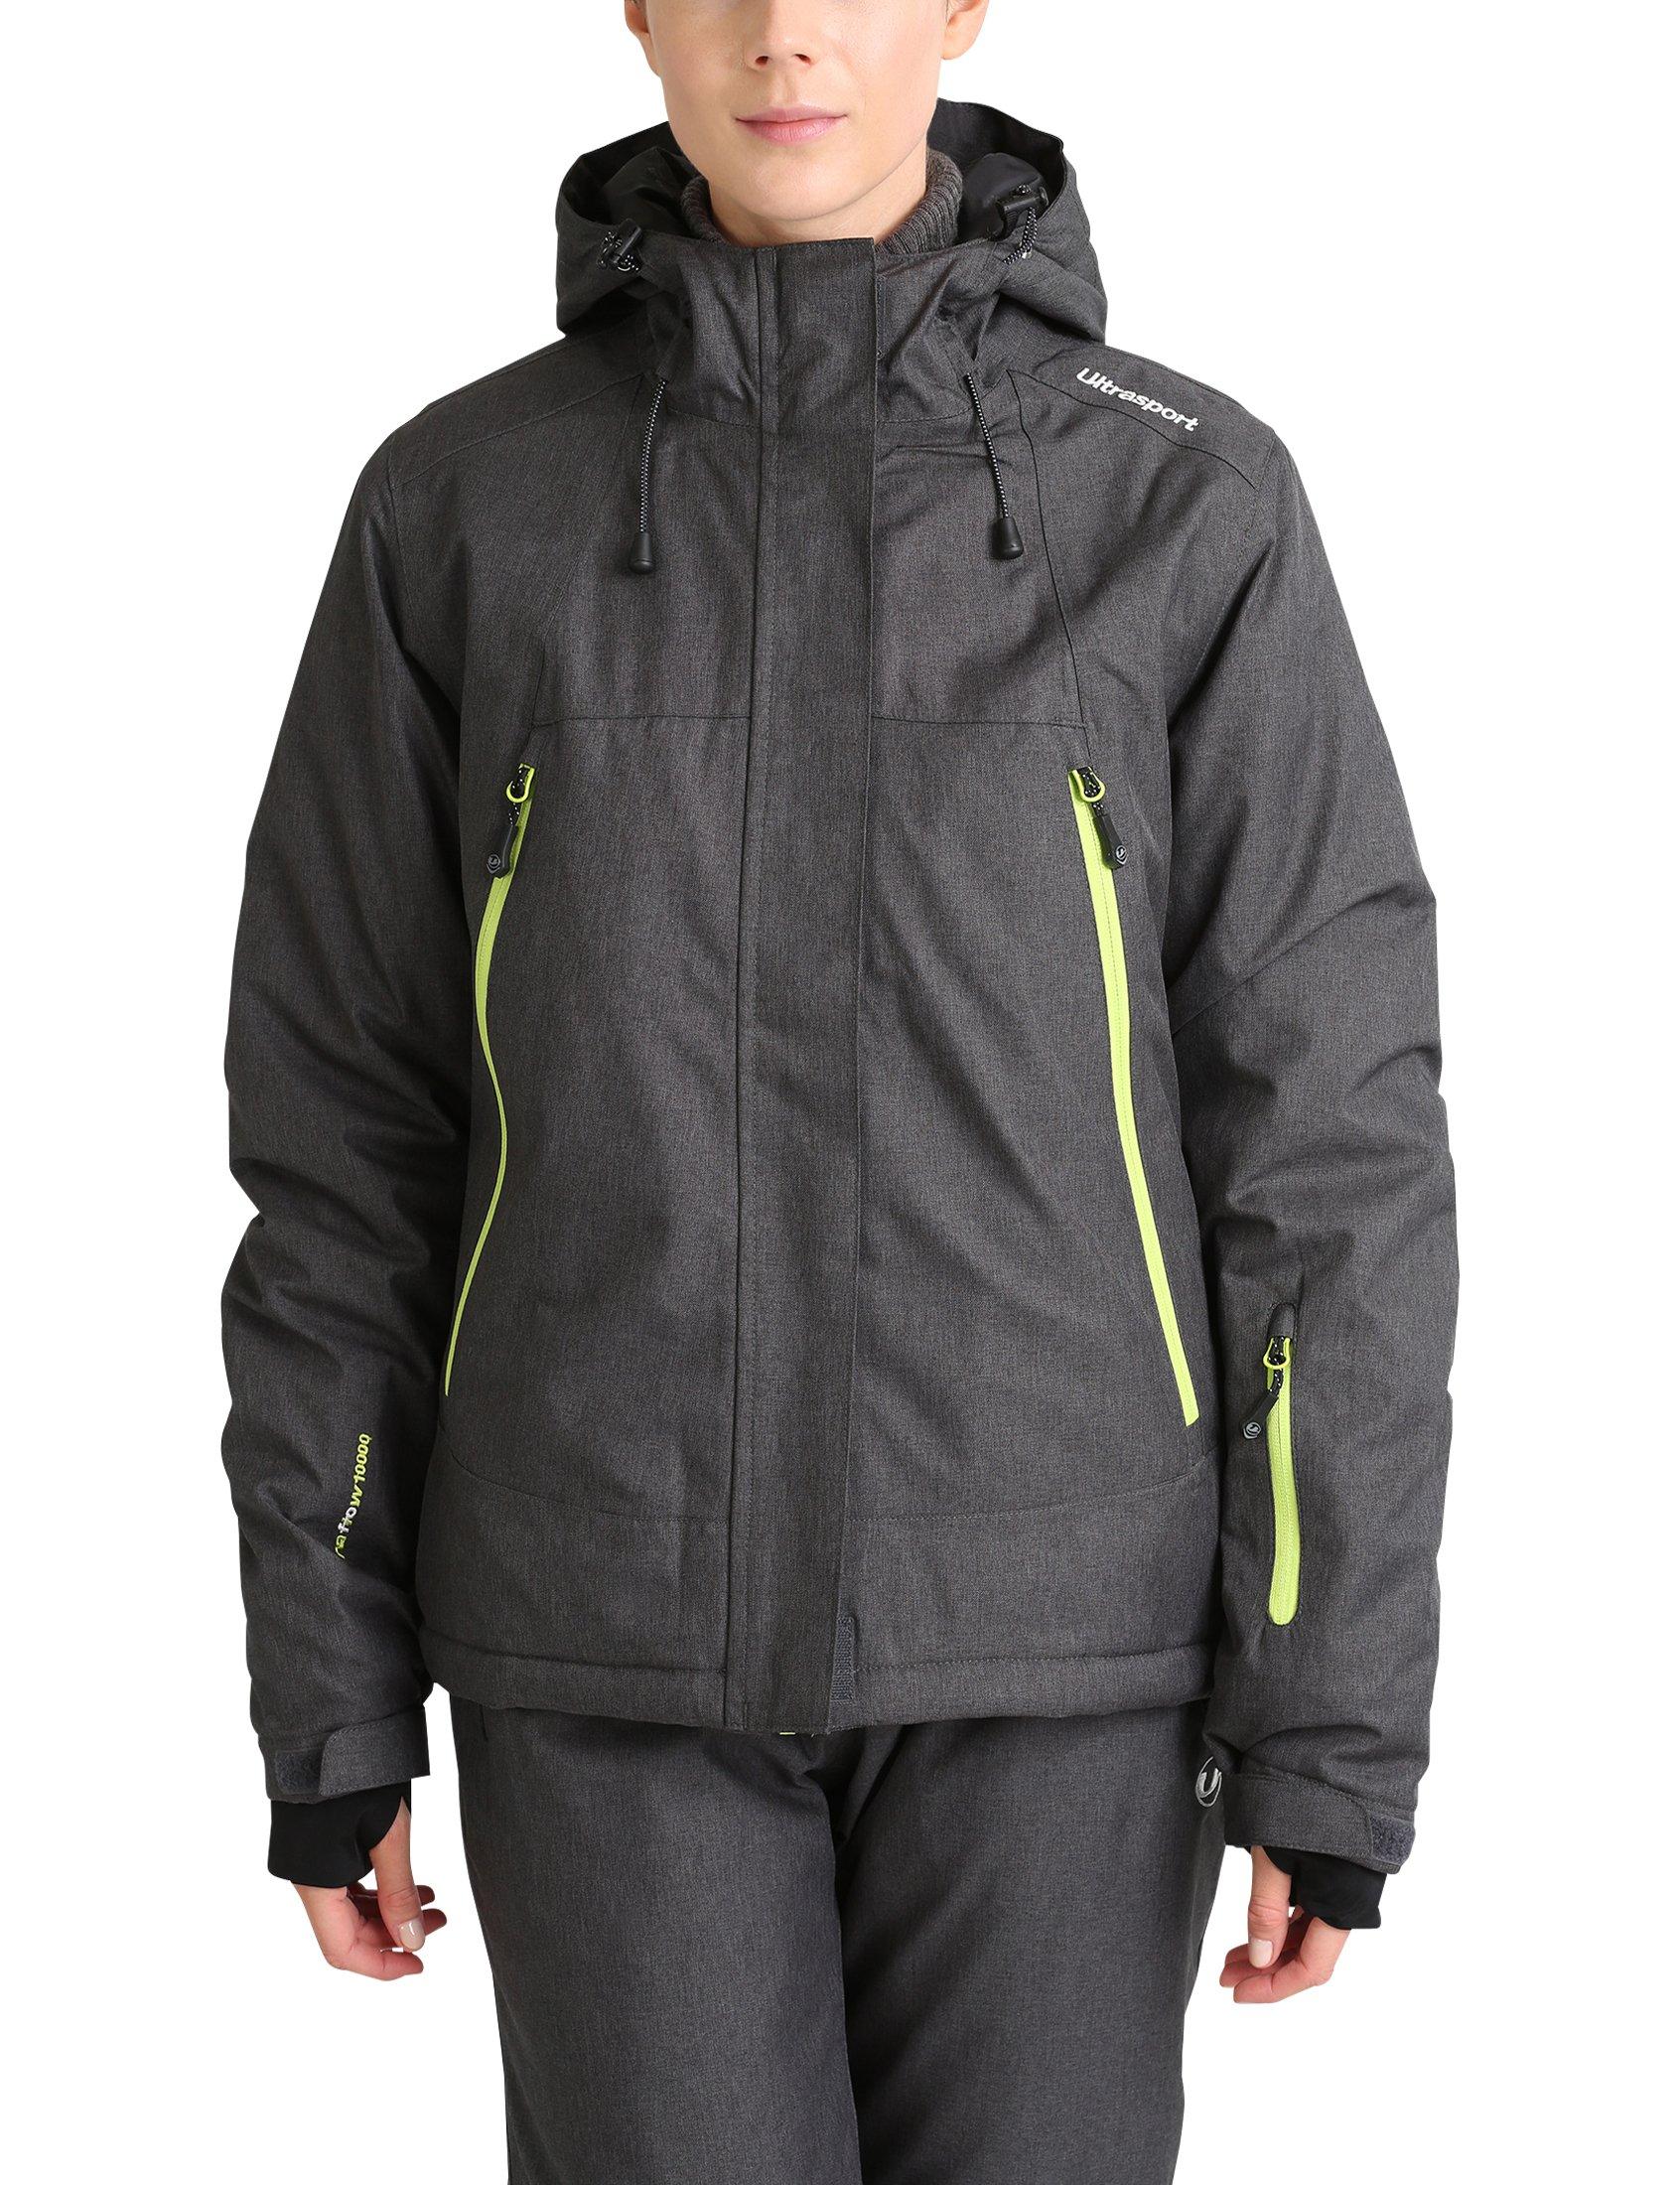 Ultrasport Mel Veste de Ski Femme product image